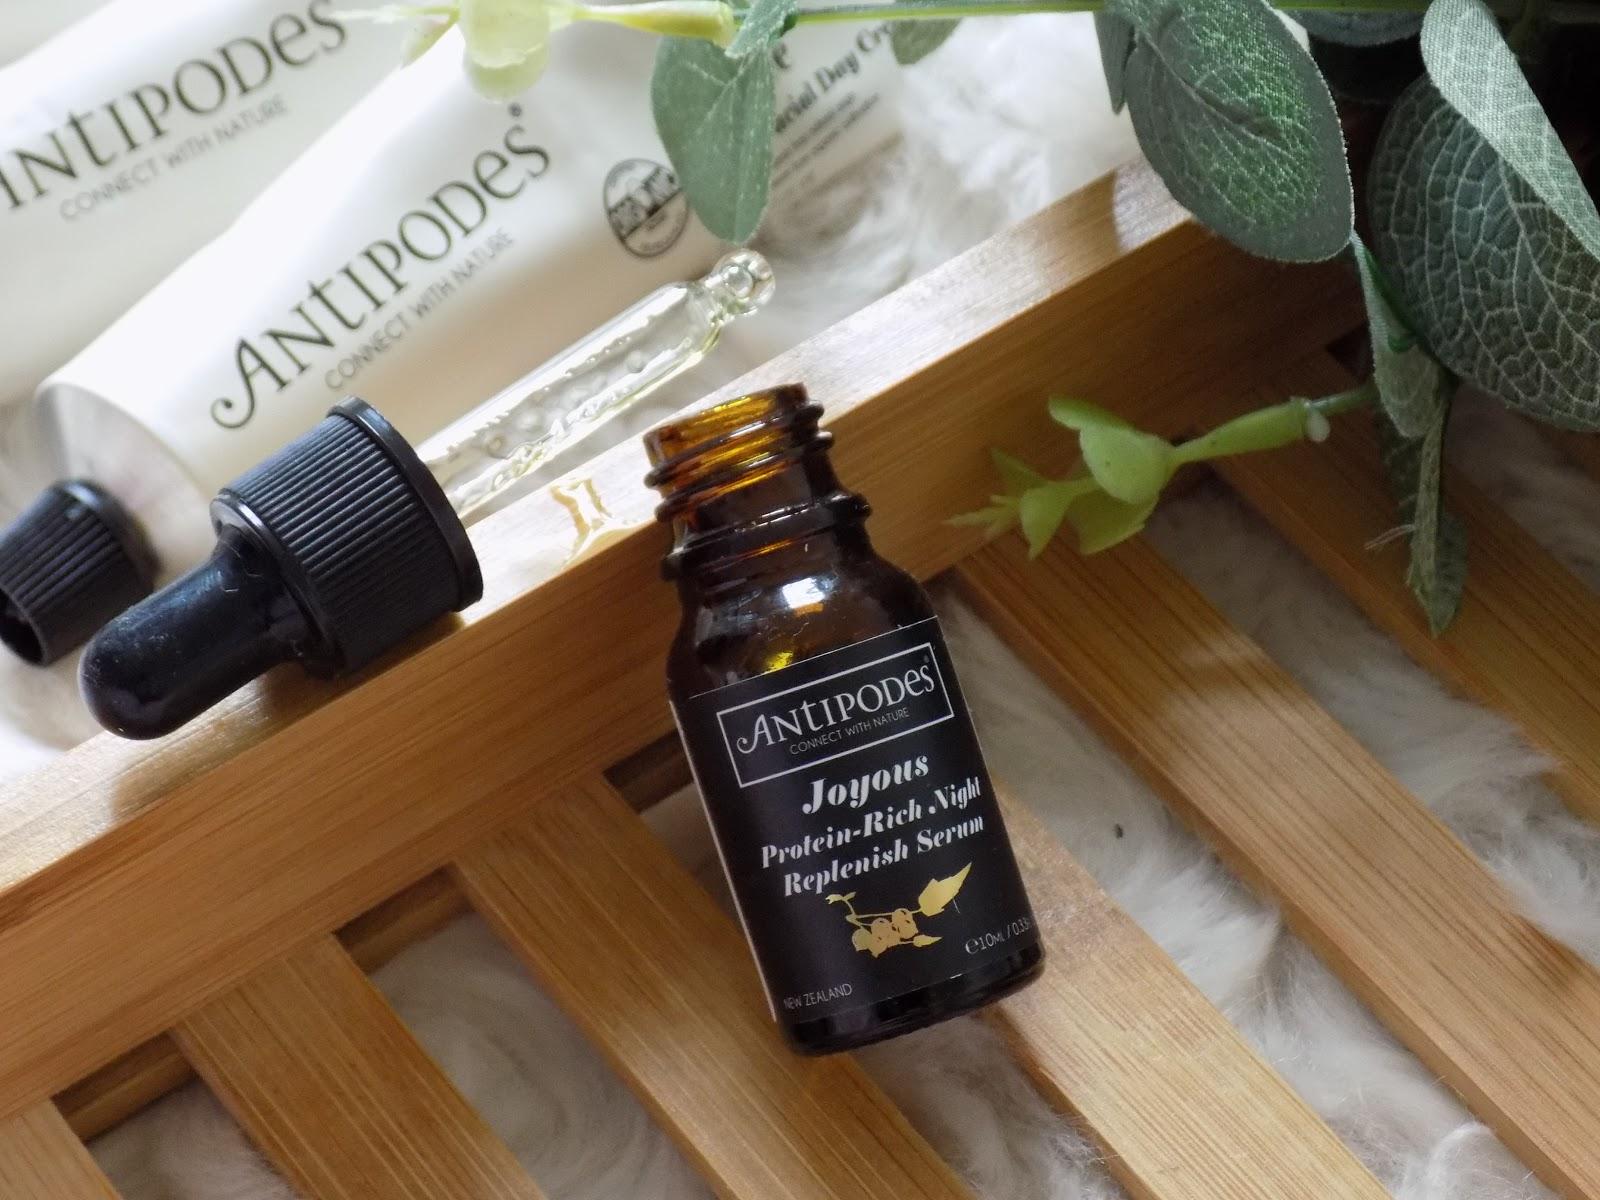 Antipodes Joyous Protein Rich Night Replenish Serum